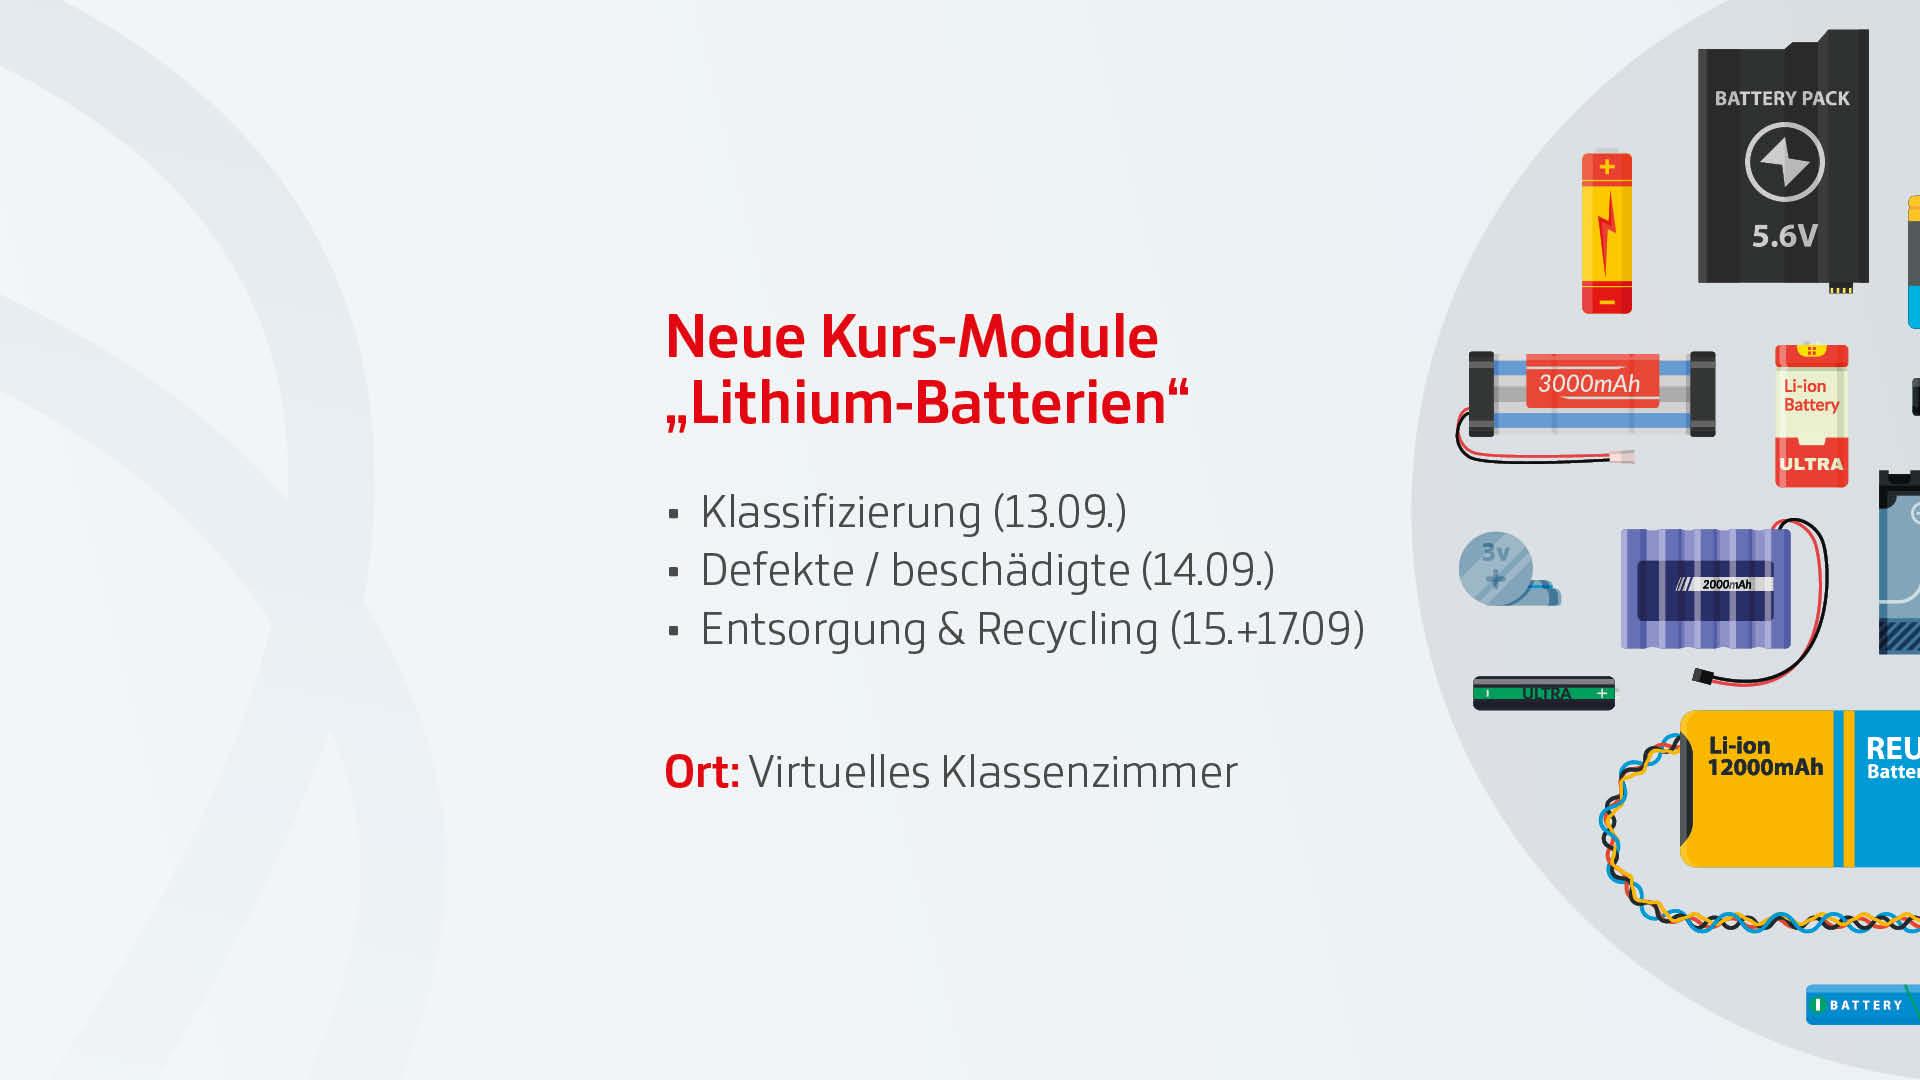 Neue Kurs-Module Lithium-Batterien